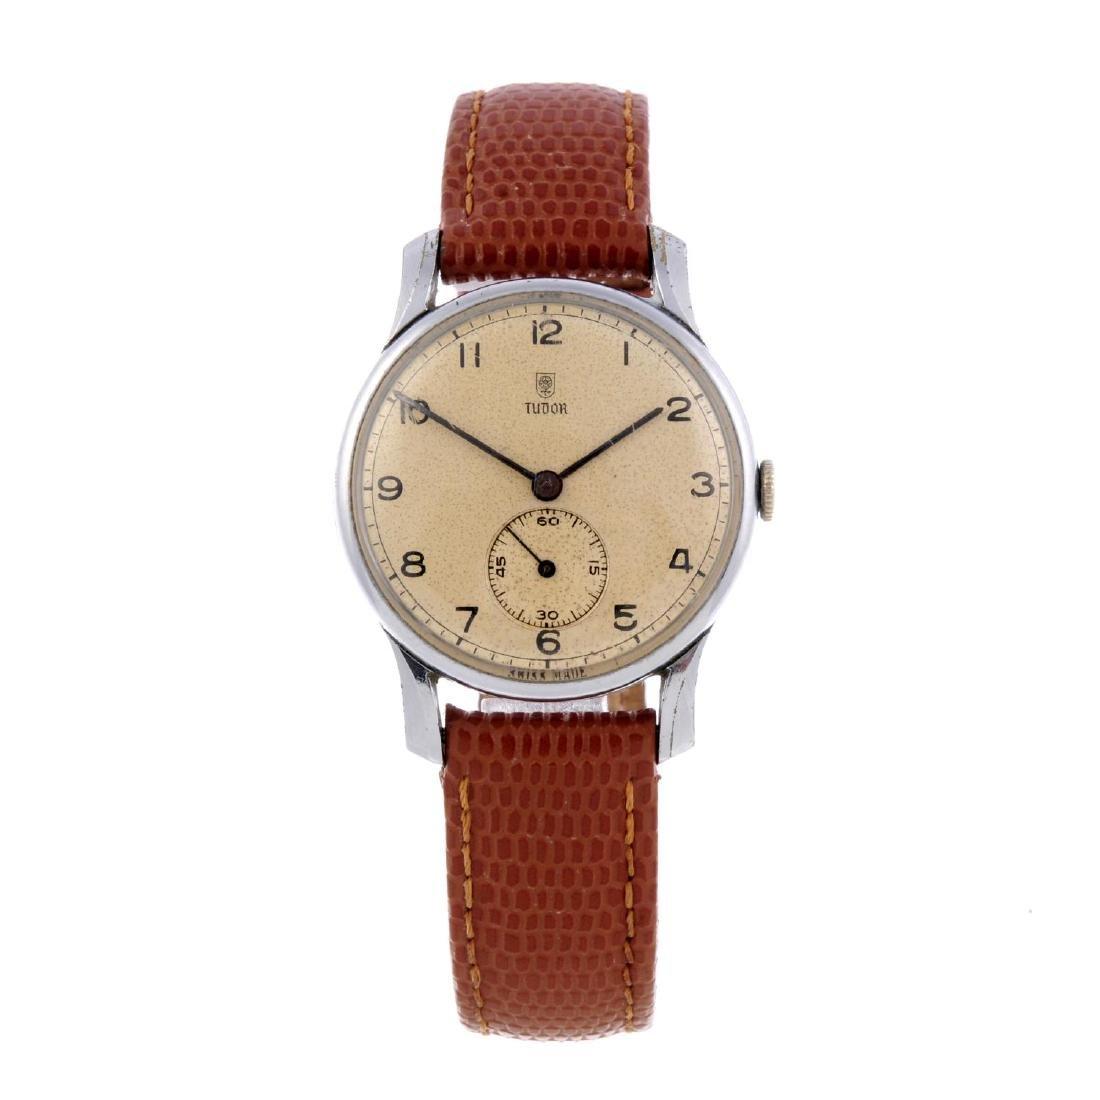 TUDOR - a gentleman's wrist watch. Base metal case with